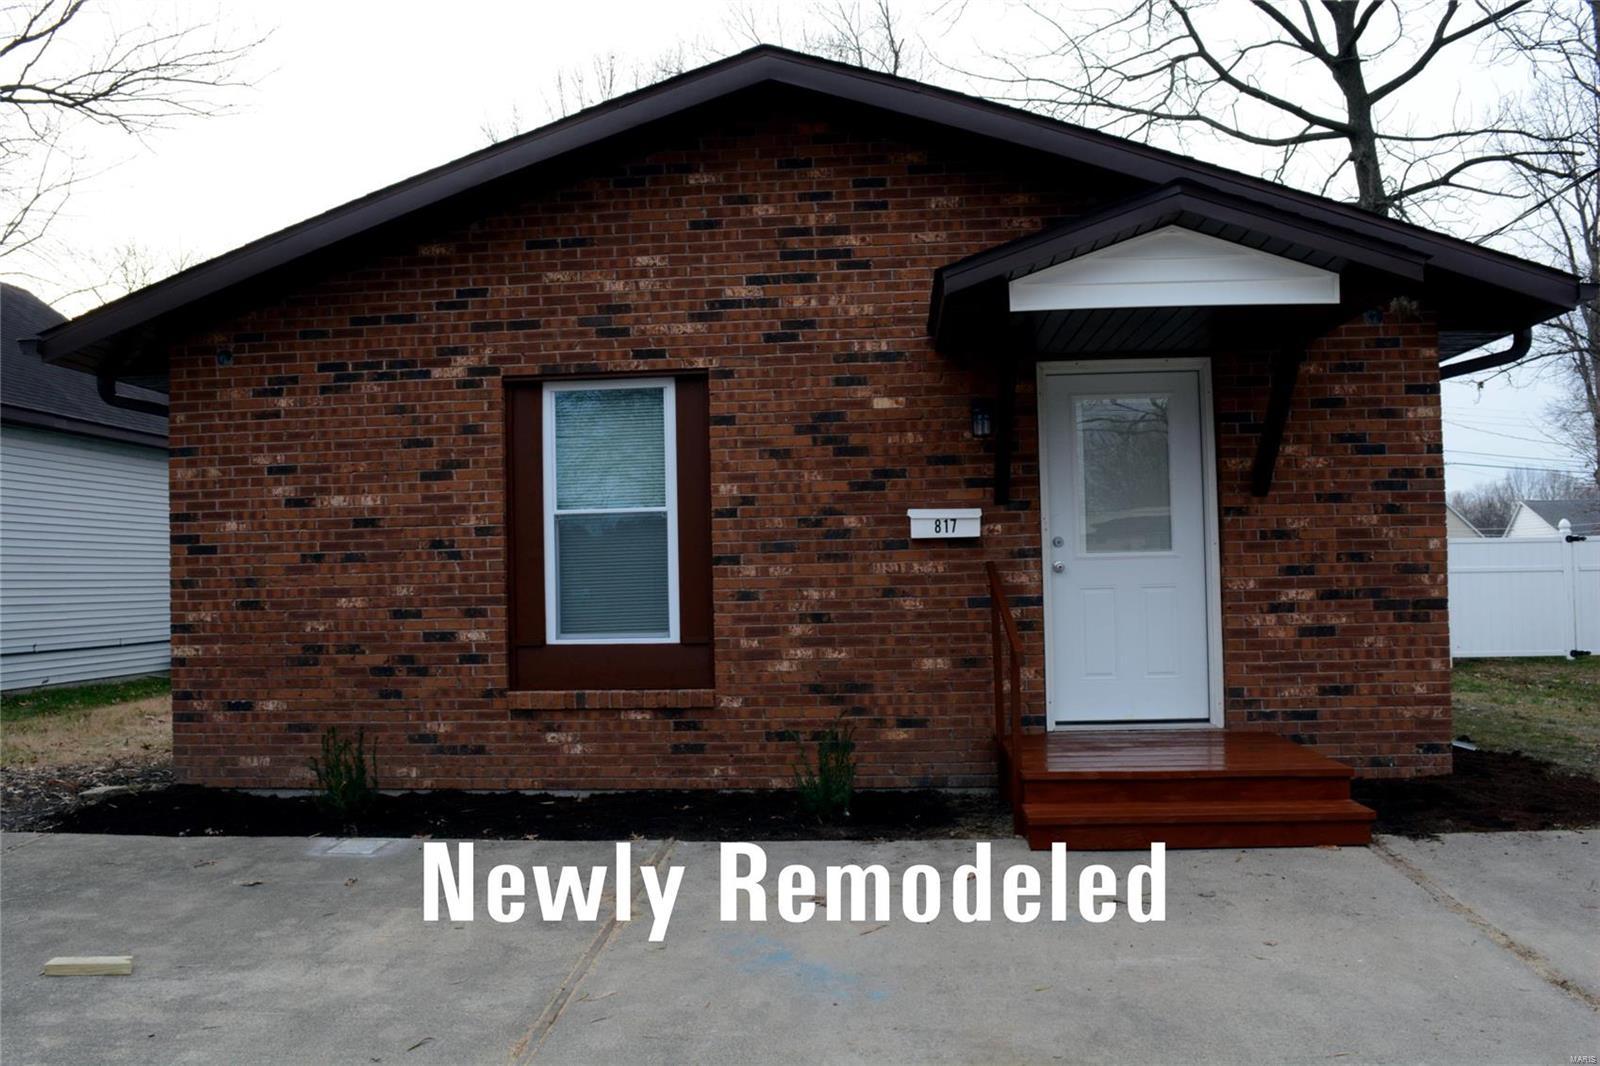 817 N Franklin Property Photo - Staunton, IL real estate listing